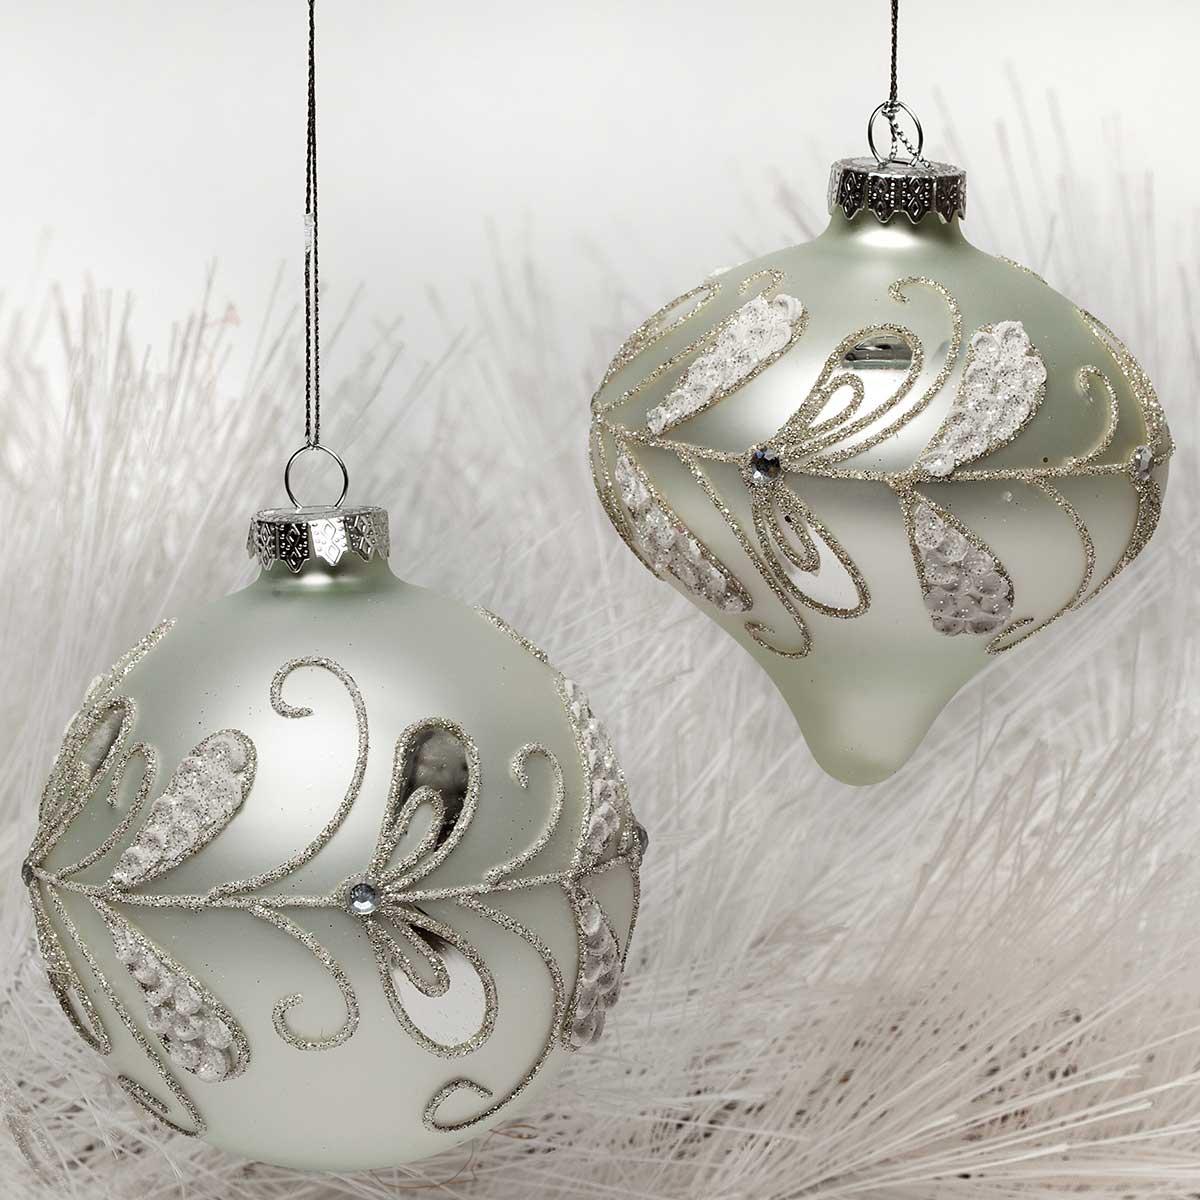 2 Piece Frost Glass Ball/Kismet Ornament Set